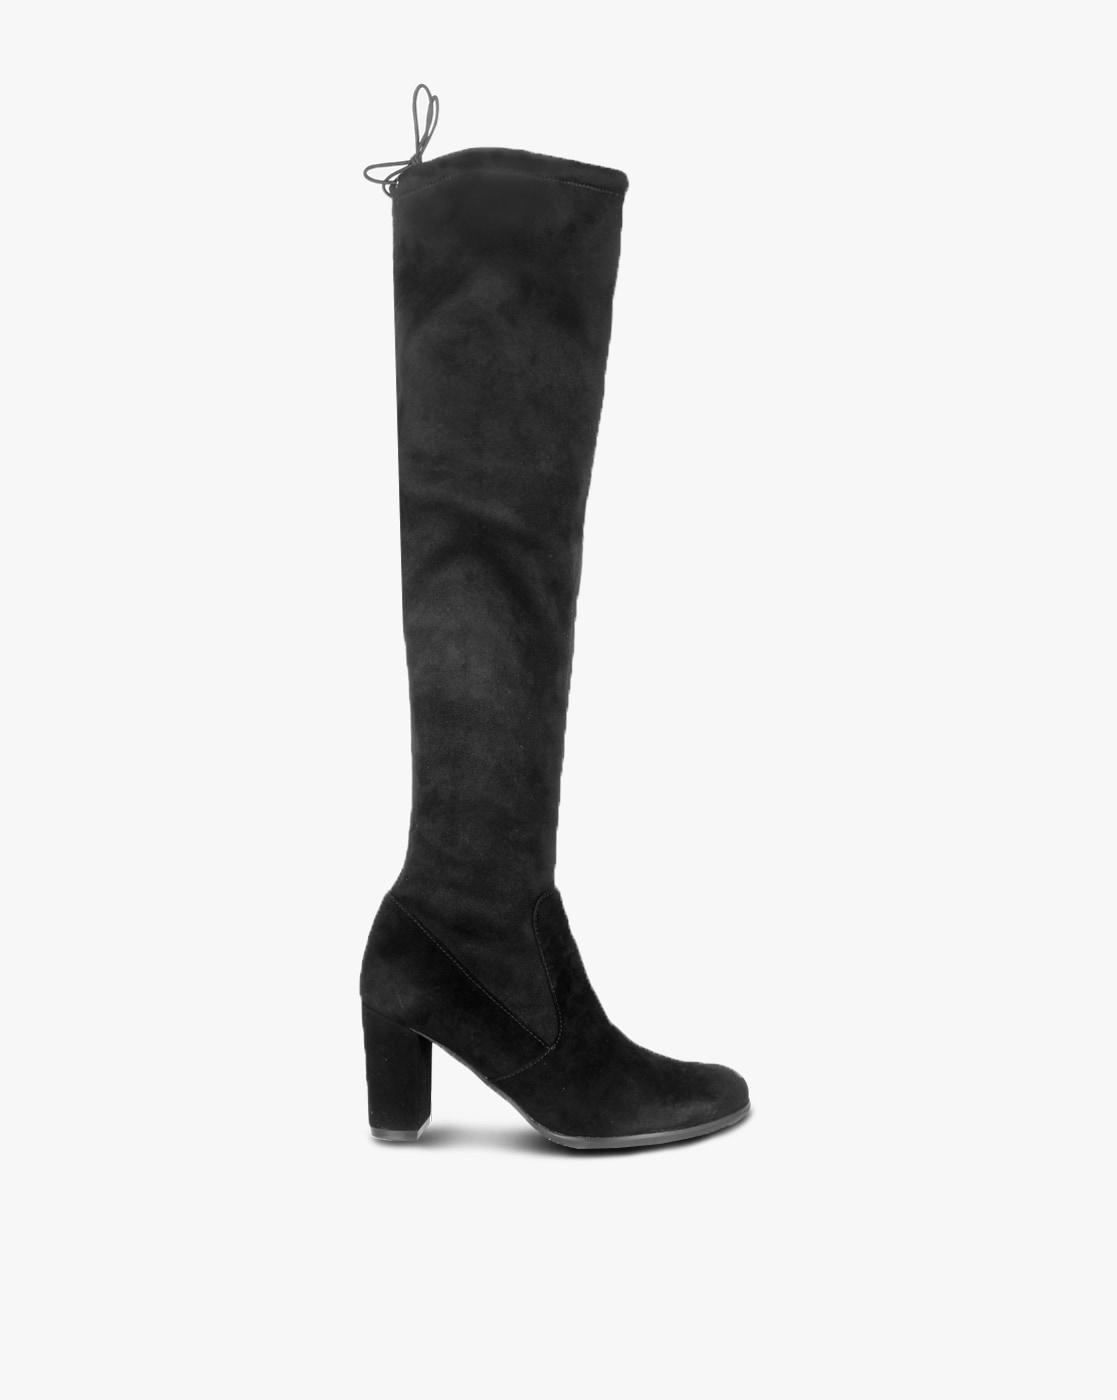 Black Boots for Women by STEVE MADDEN